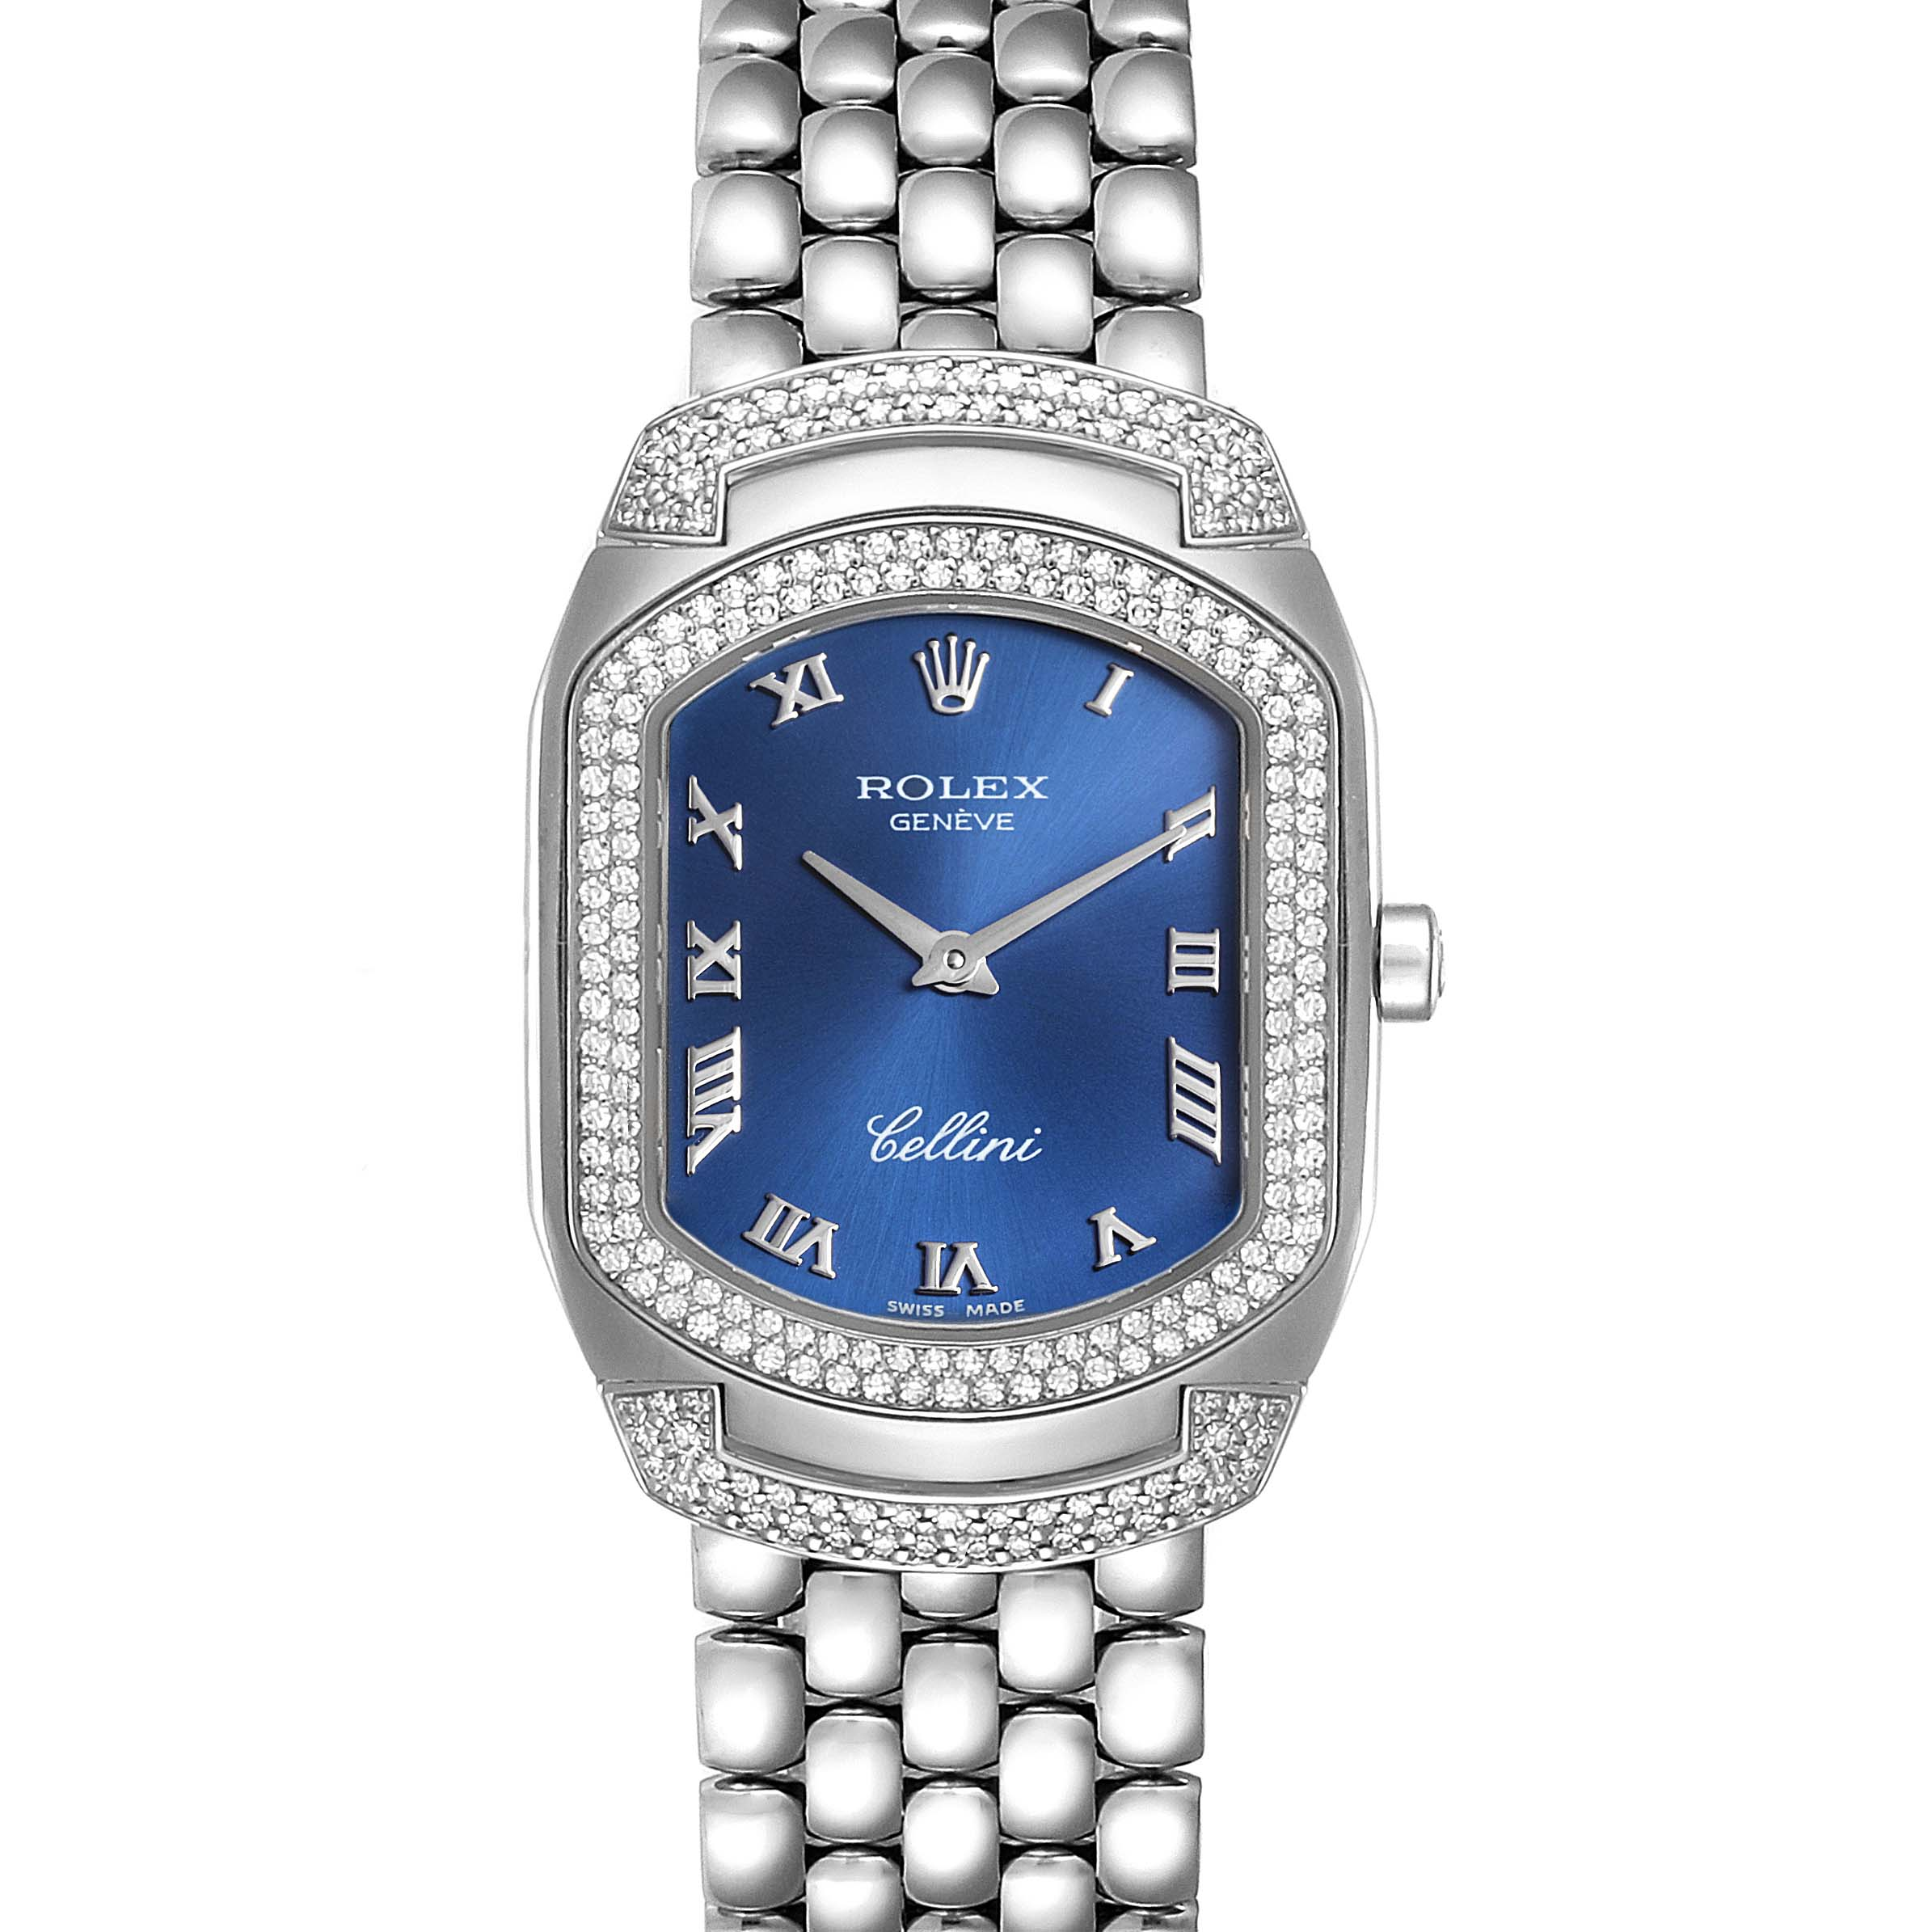 Rolex Cellini Cellissima Blue Dial White Gold Diamond Ladies Watch 6693